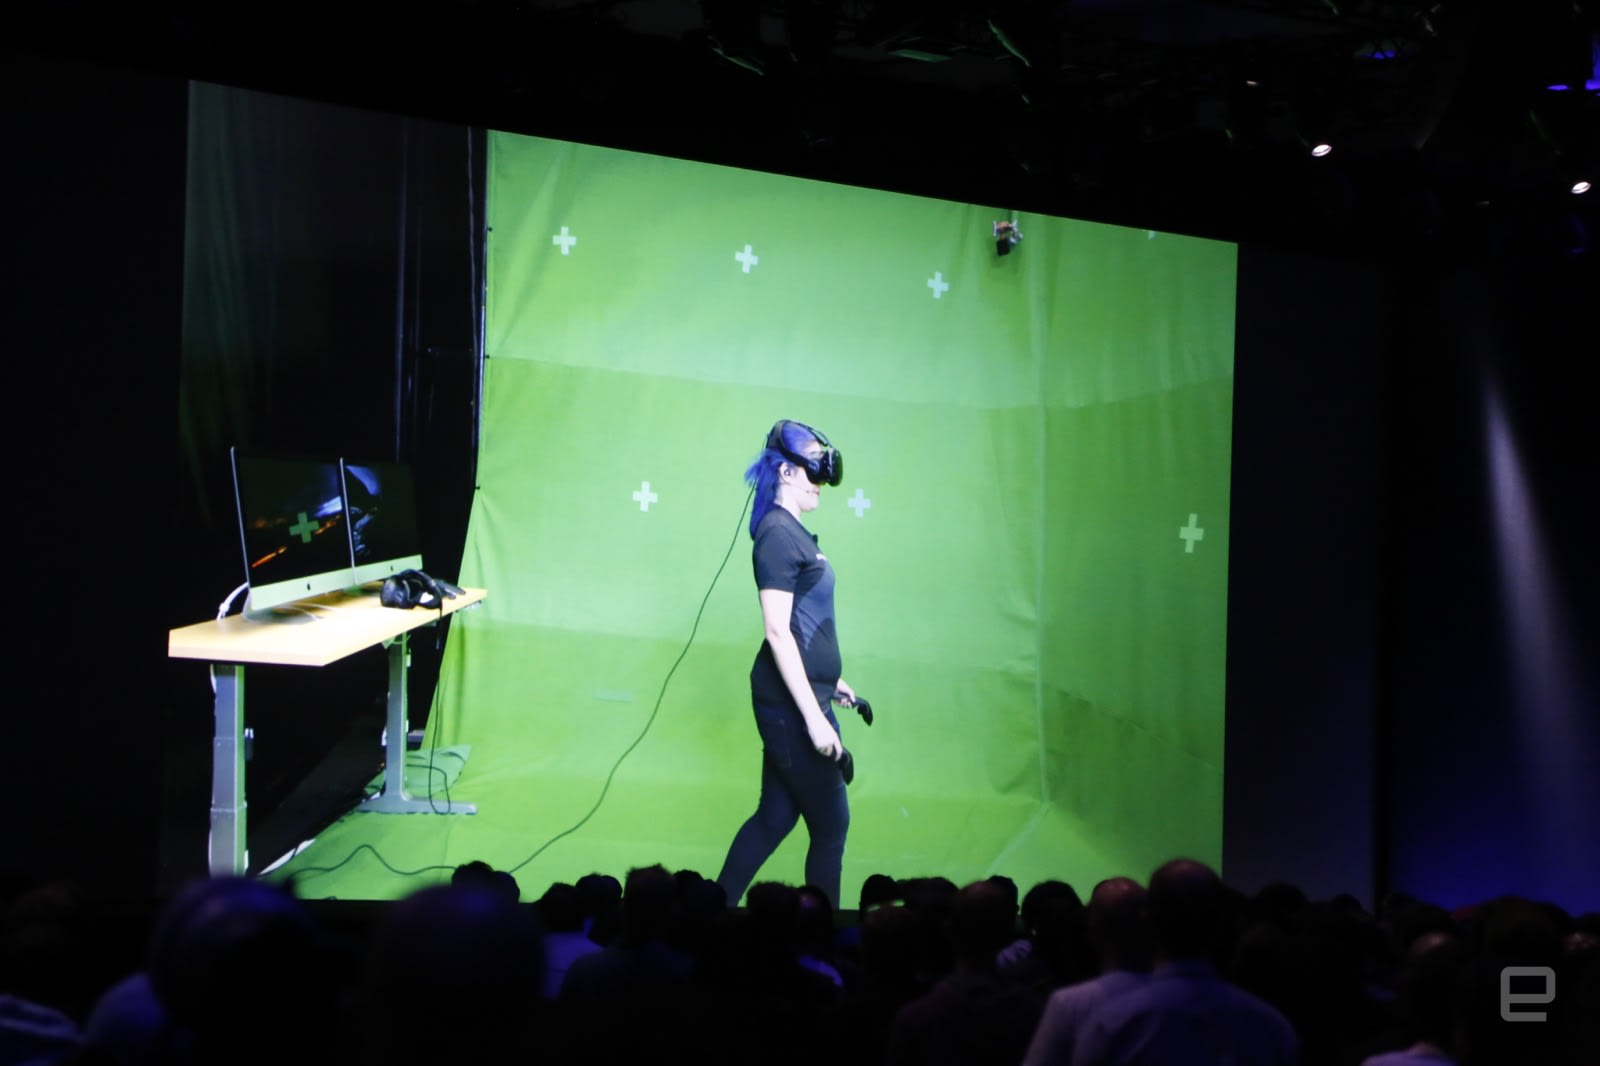 Steam brings virtual reality to macOS